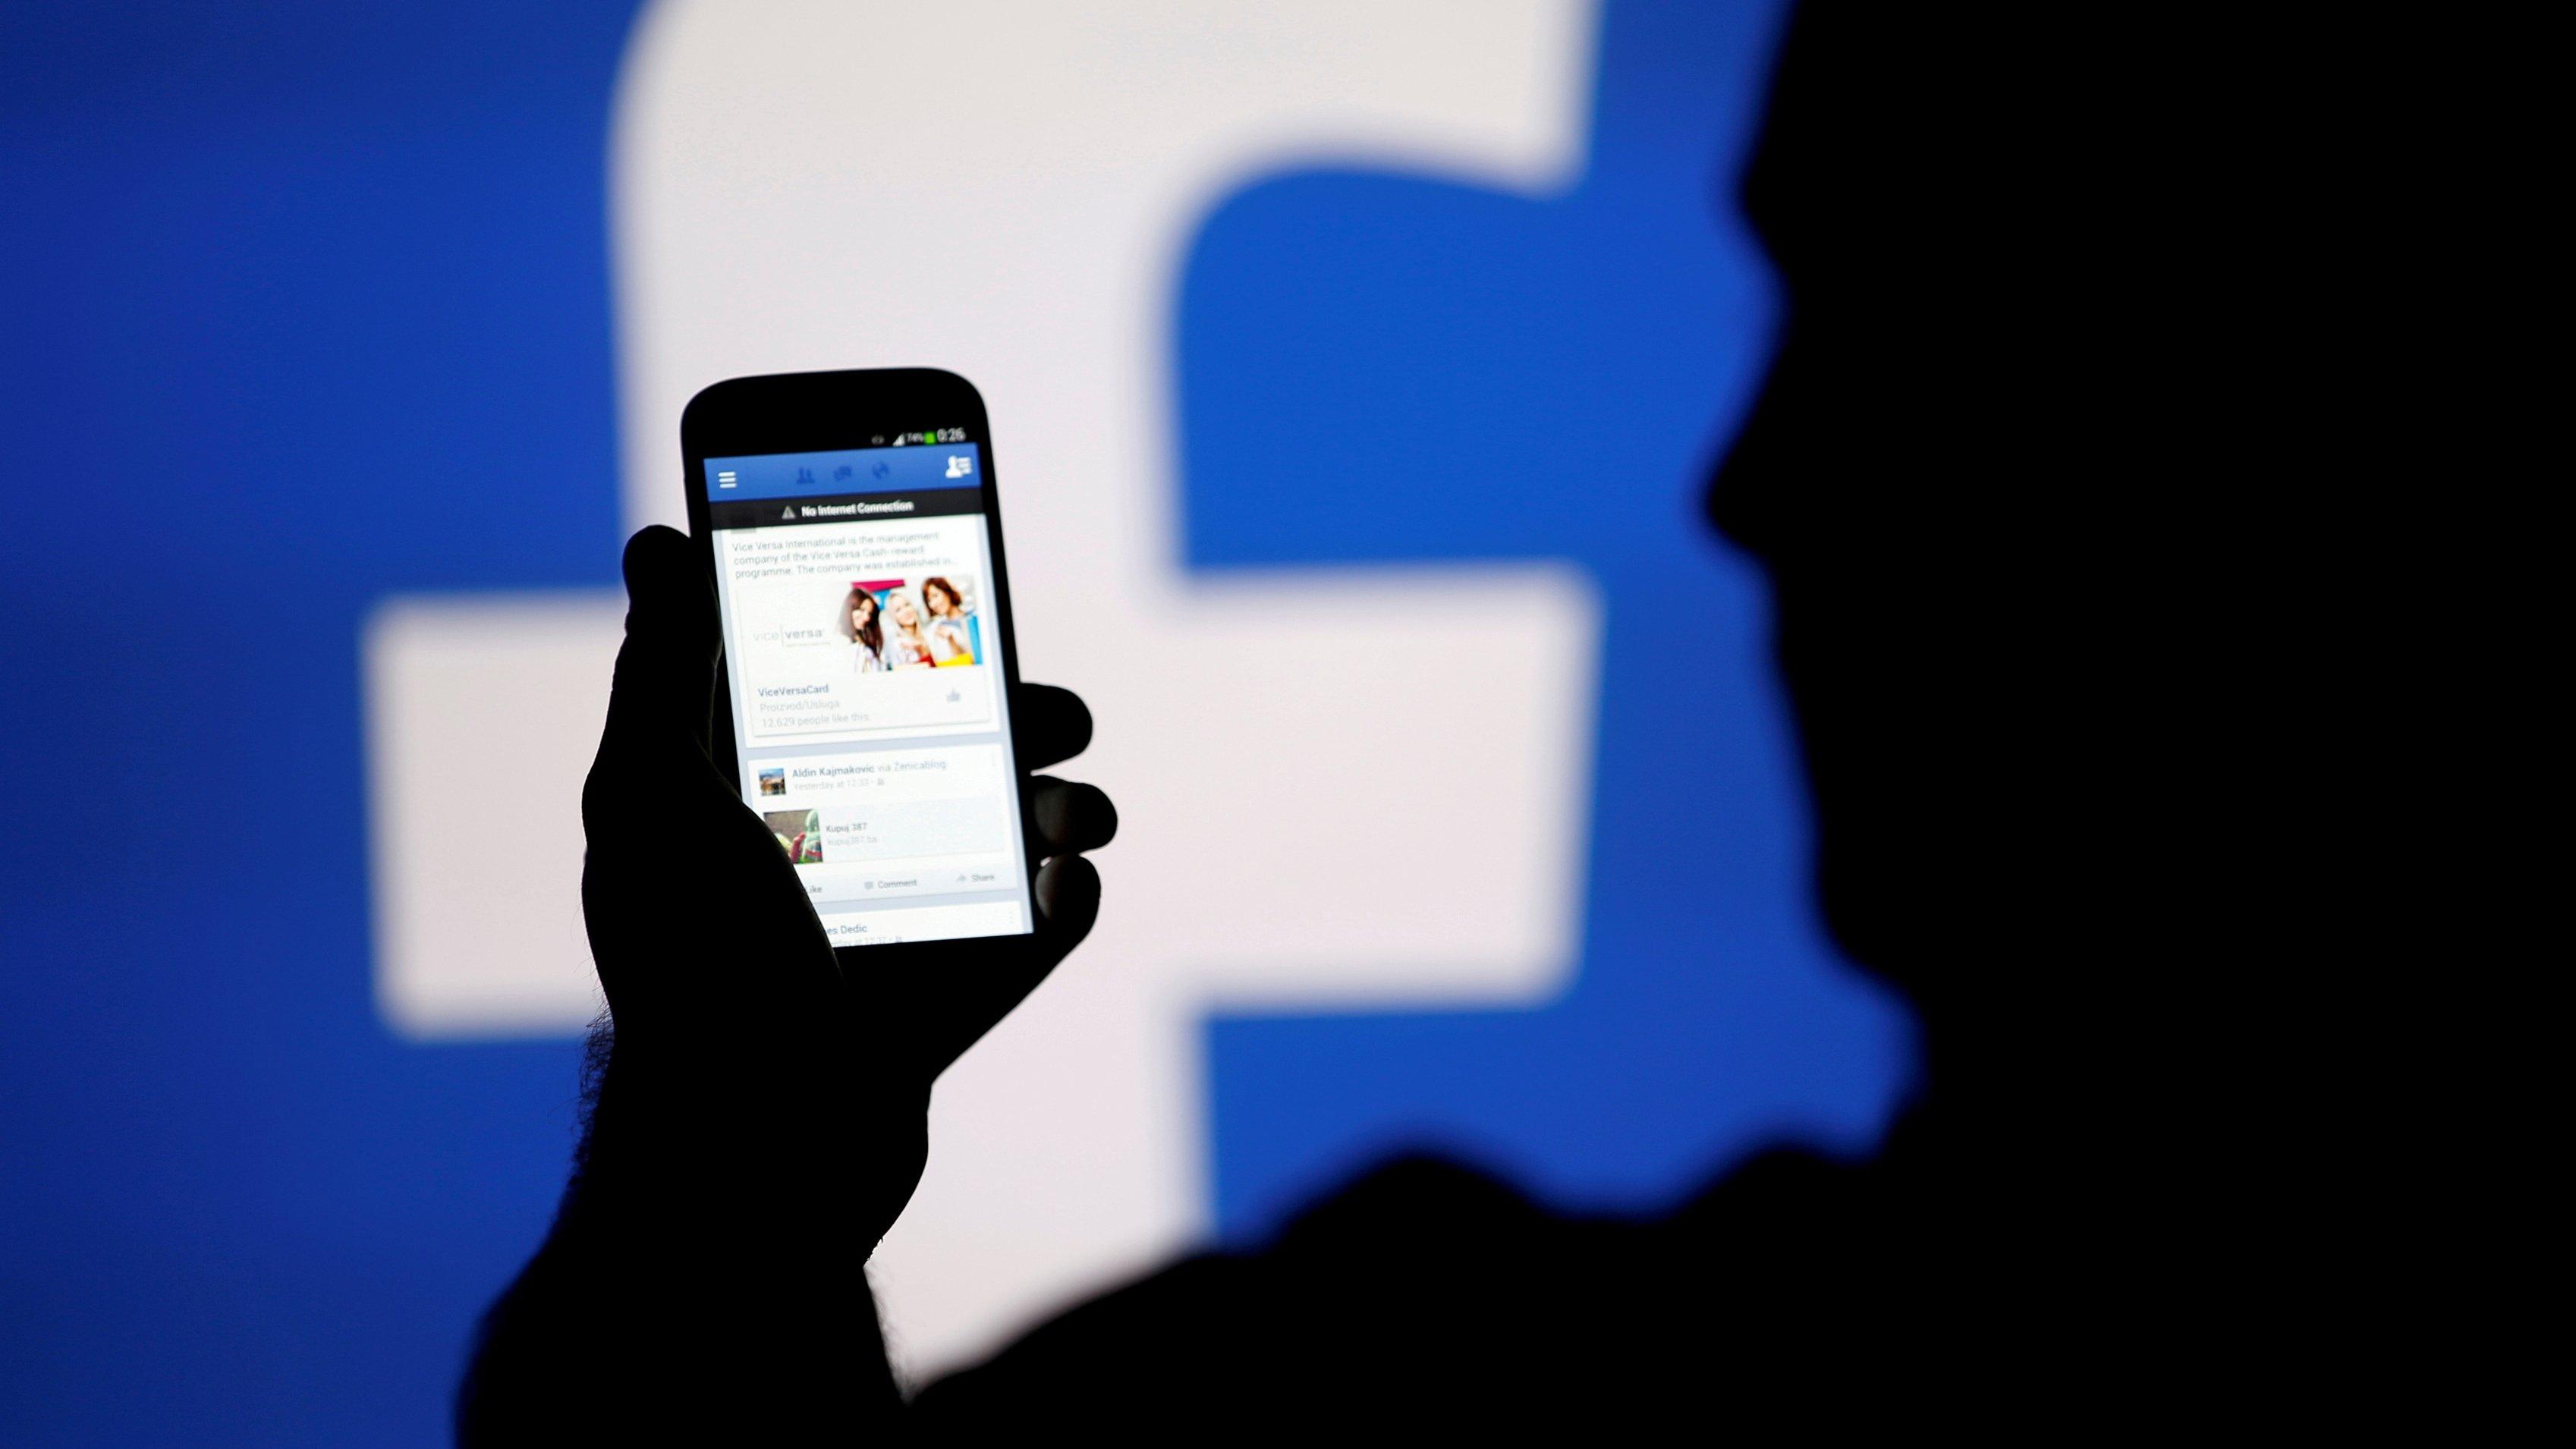 Europa investigará uso indebido de datos de usuarios de Facebook